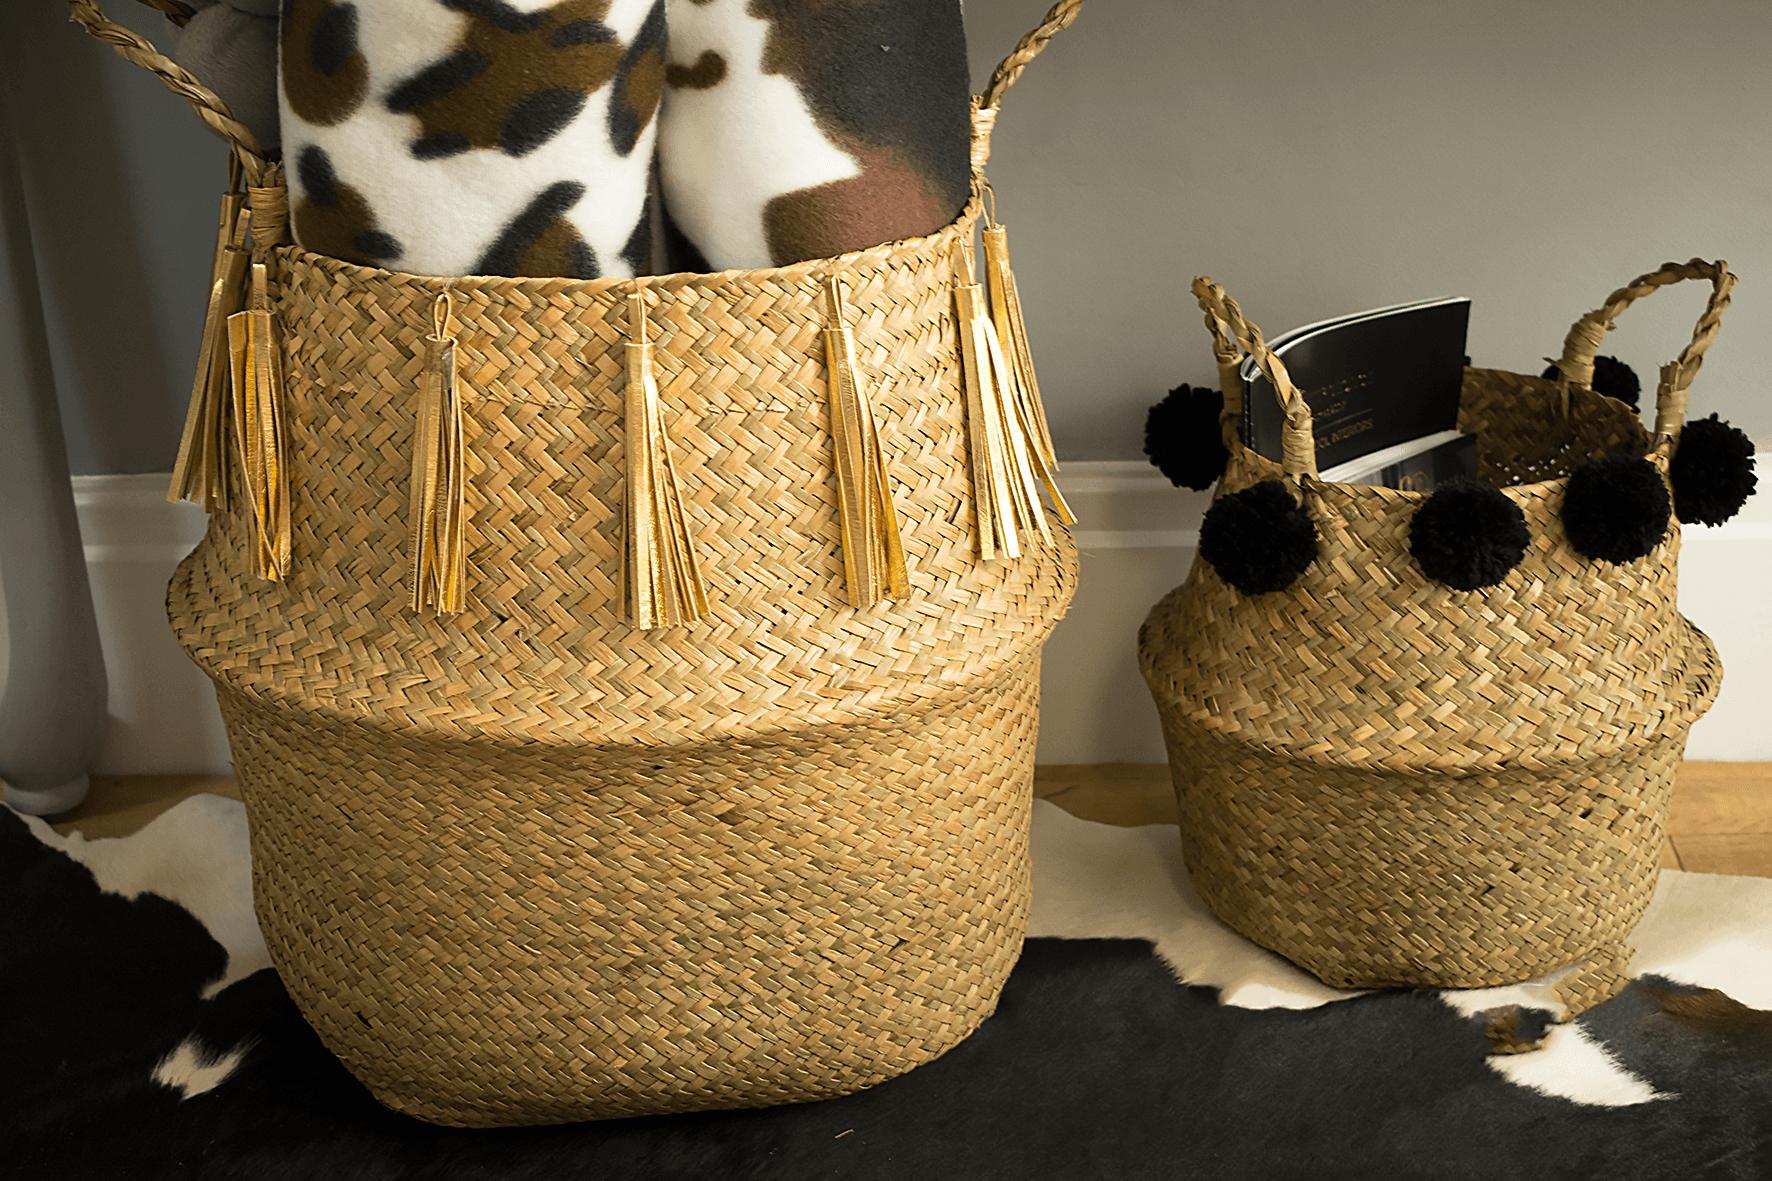 Belly Baskets